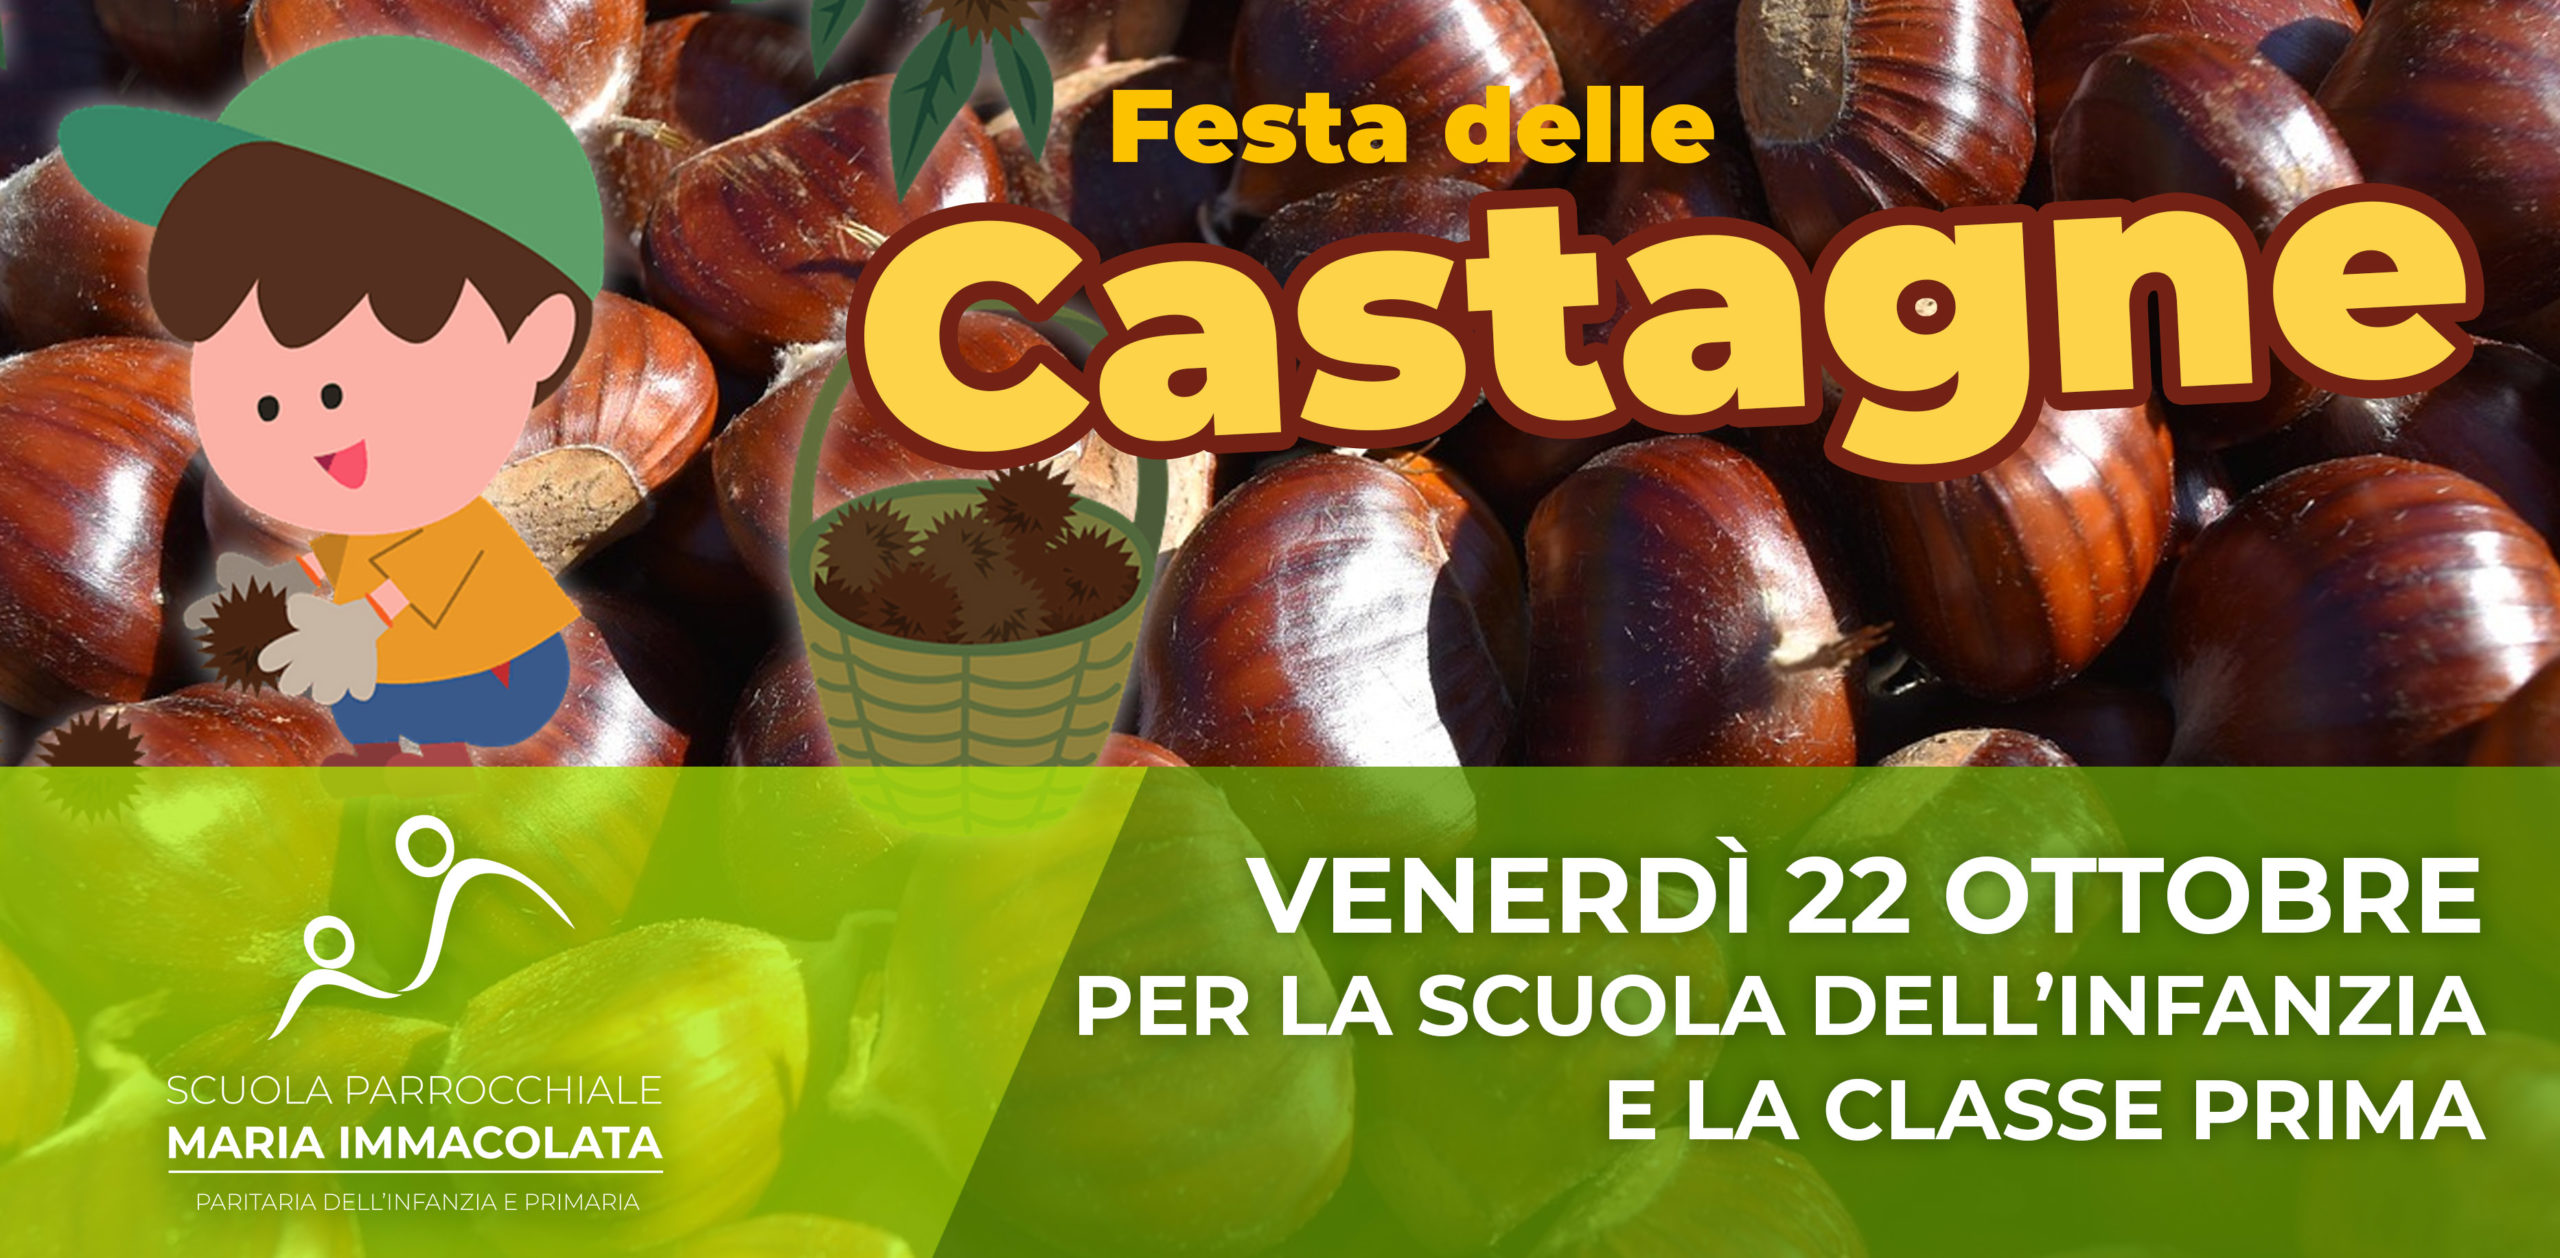 Venerdì 22 ottobre 2021: Festa delle castagne